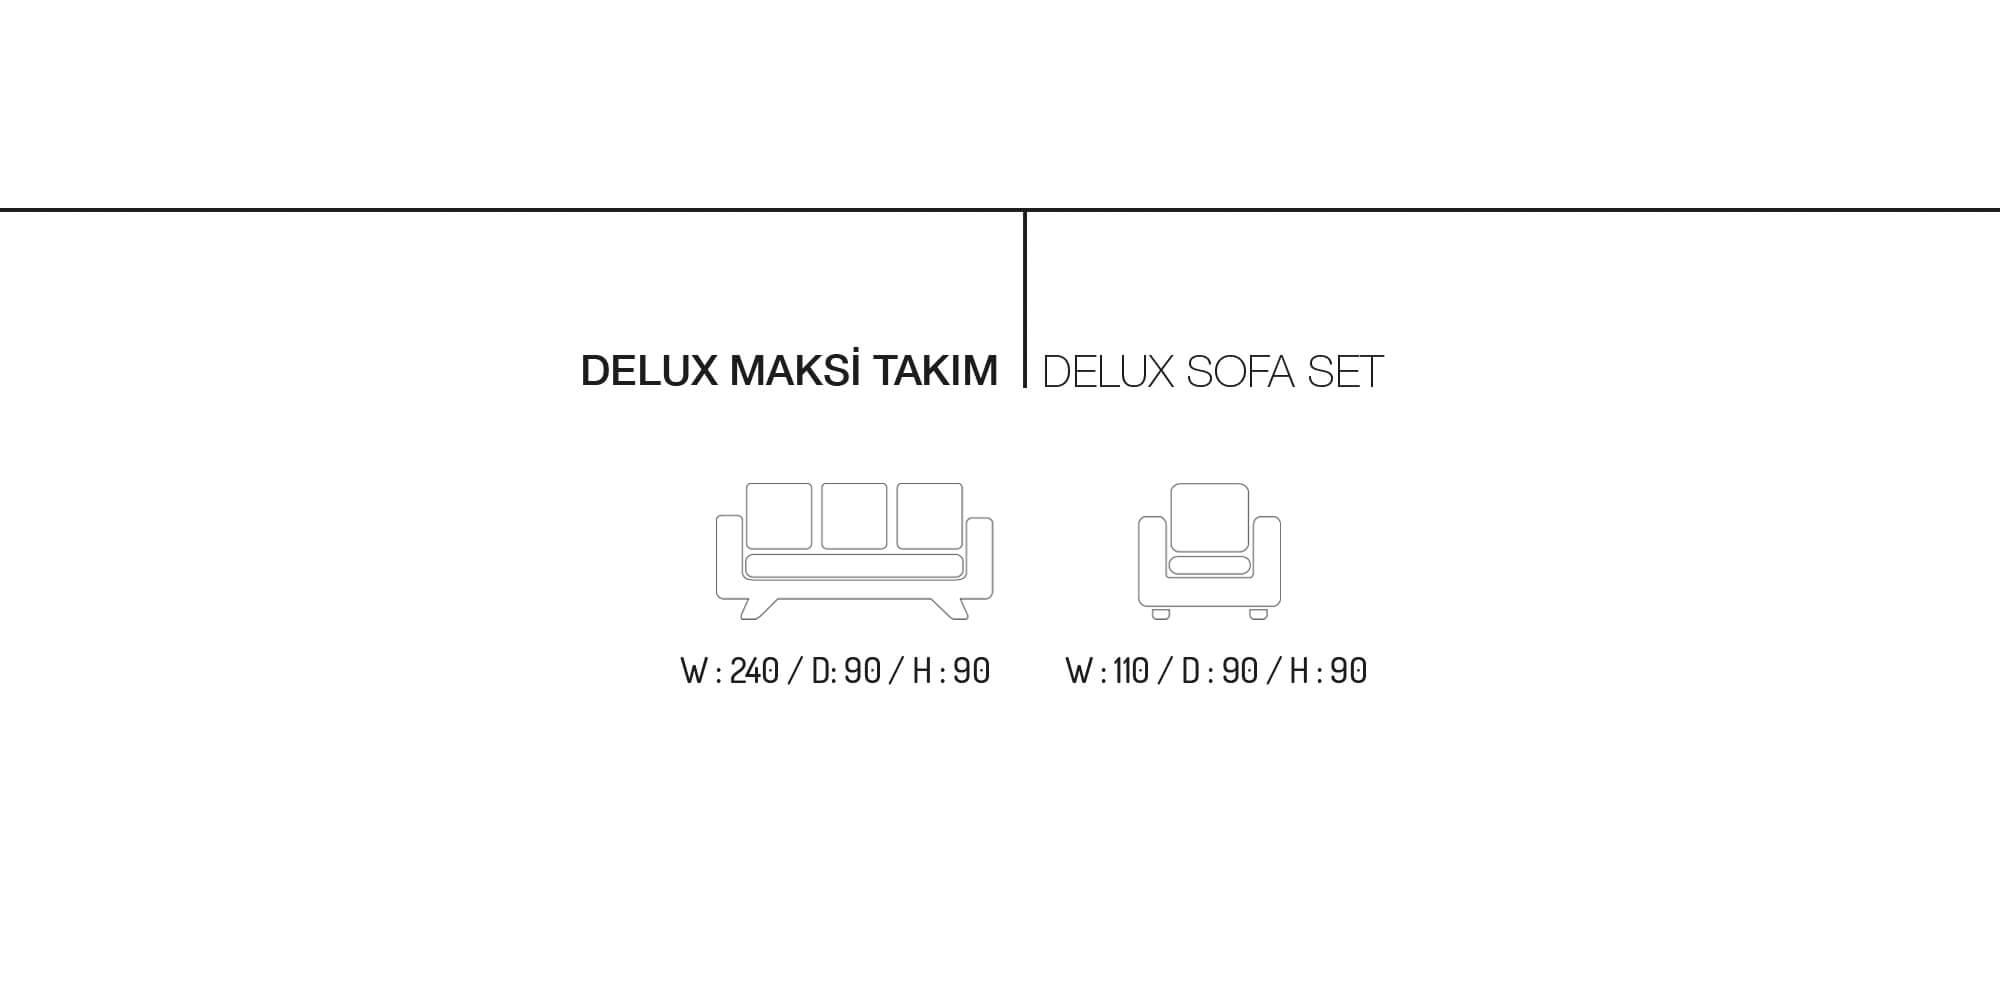 kristal-deluxe-sofa-set-4